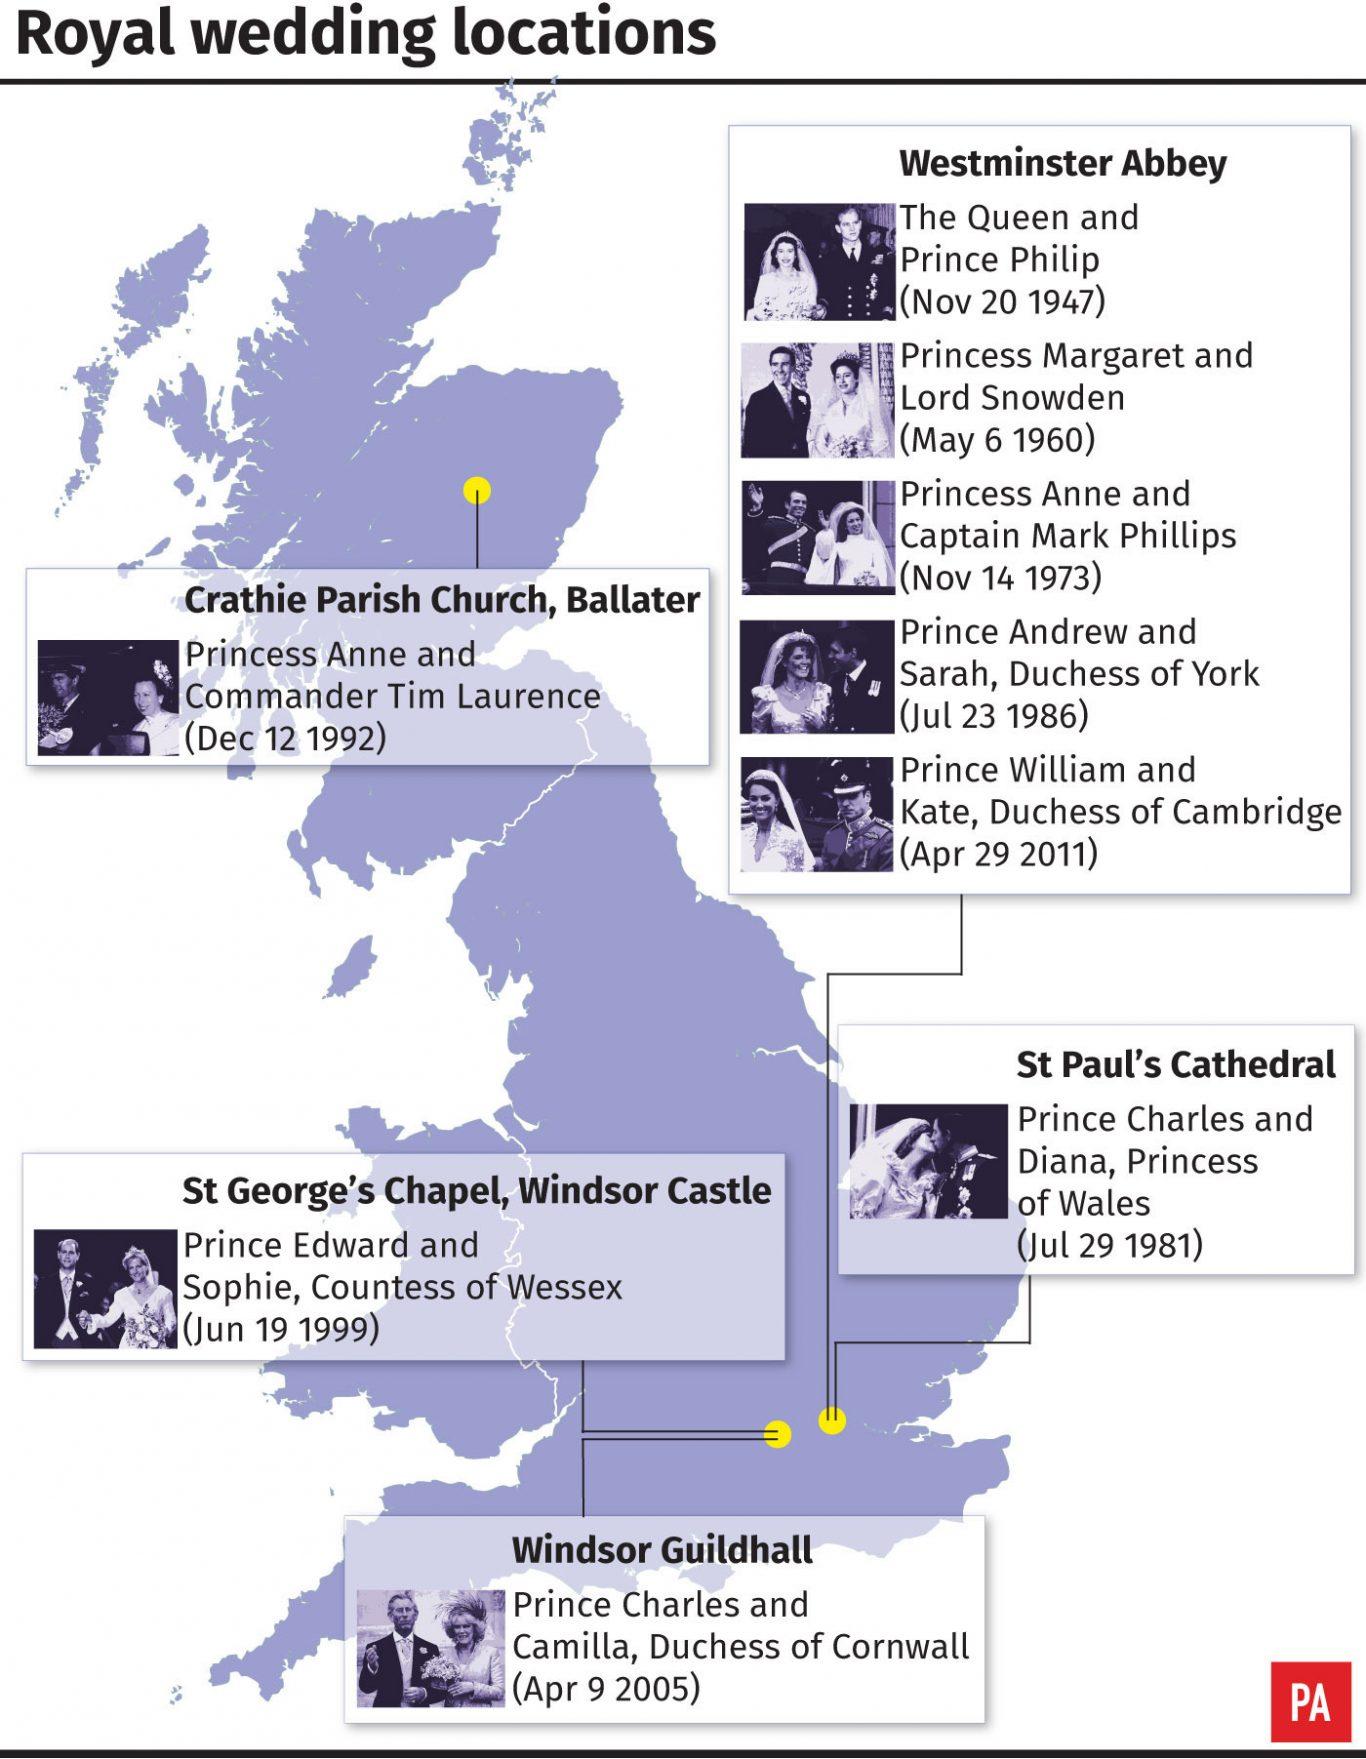 Royal wedding locations